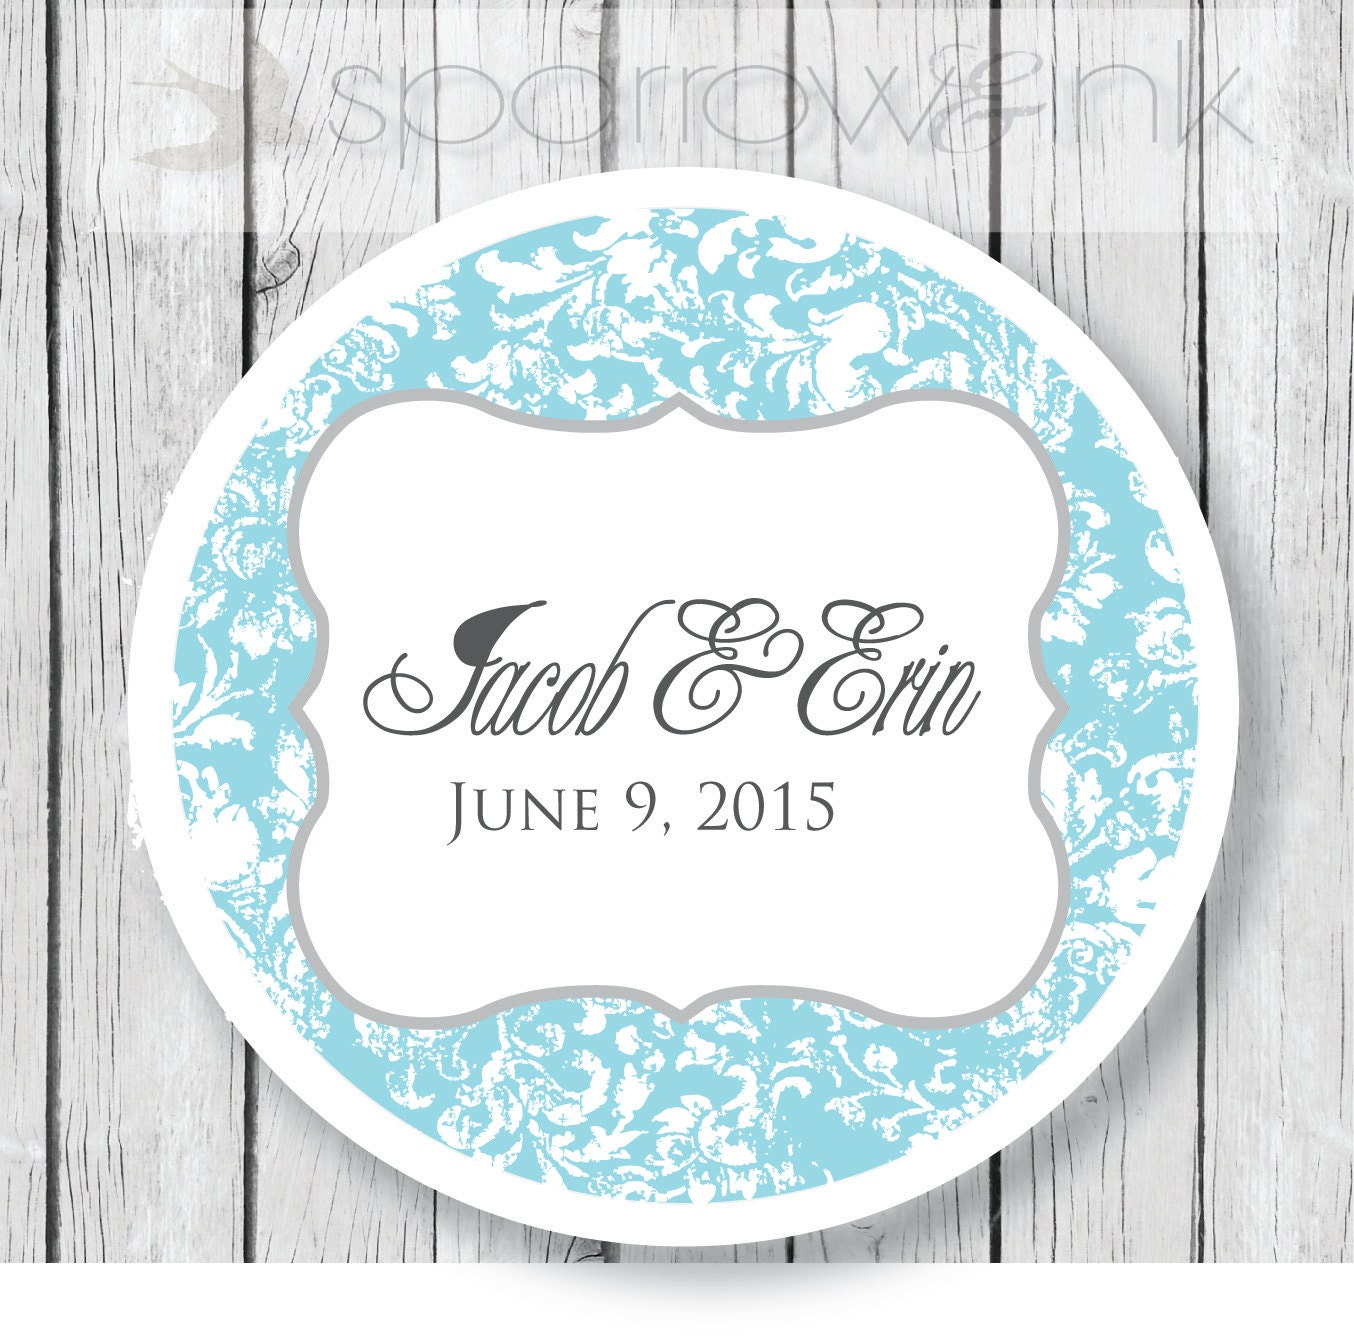 PRINTED 2 Custom Wedding Label for Mason Jar Stickers